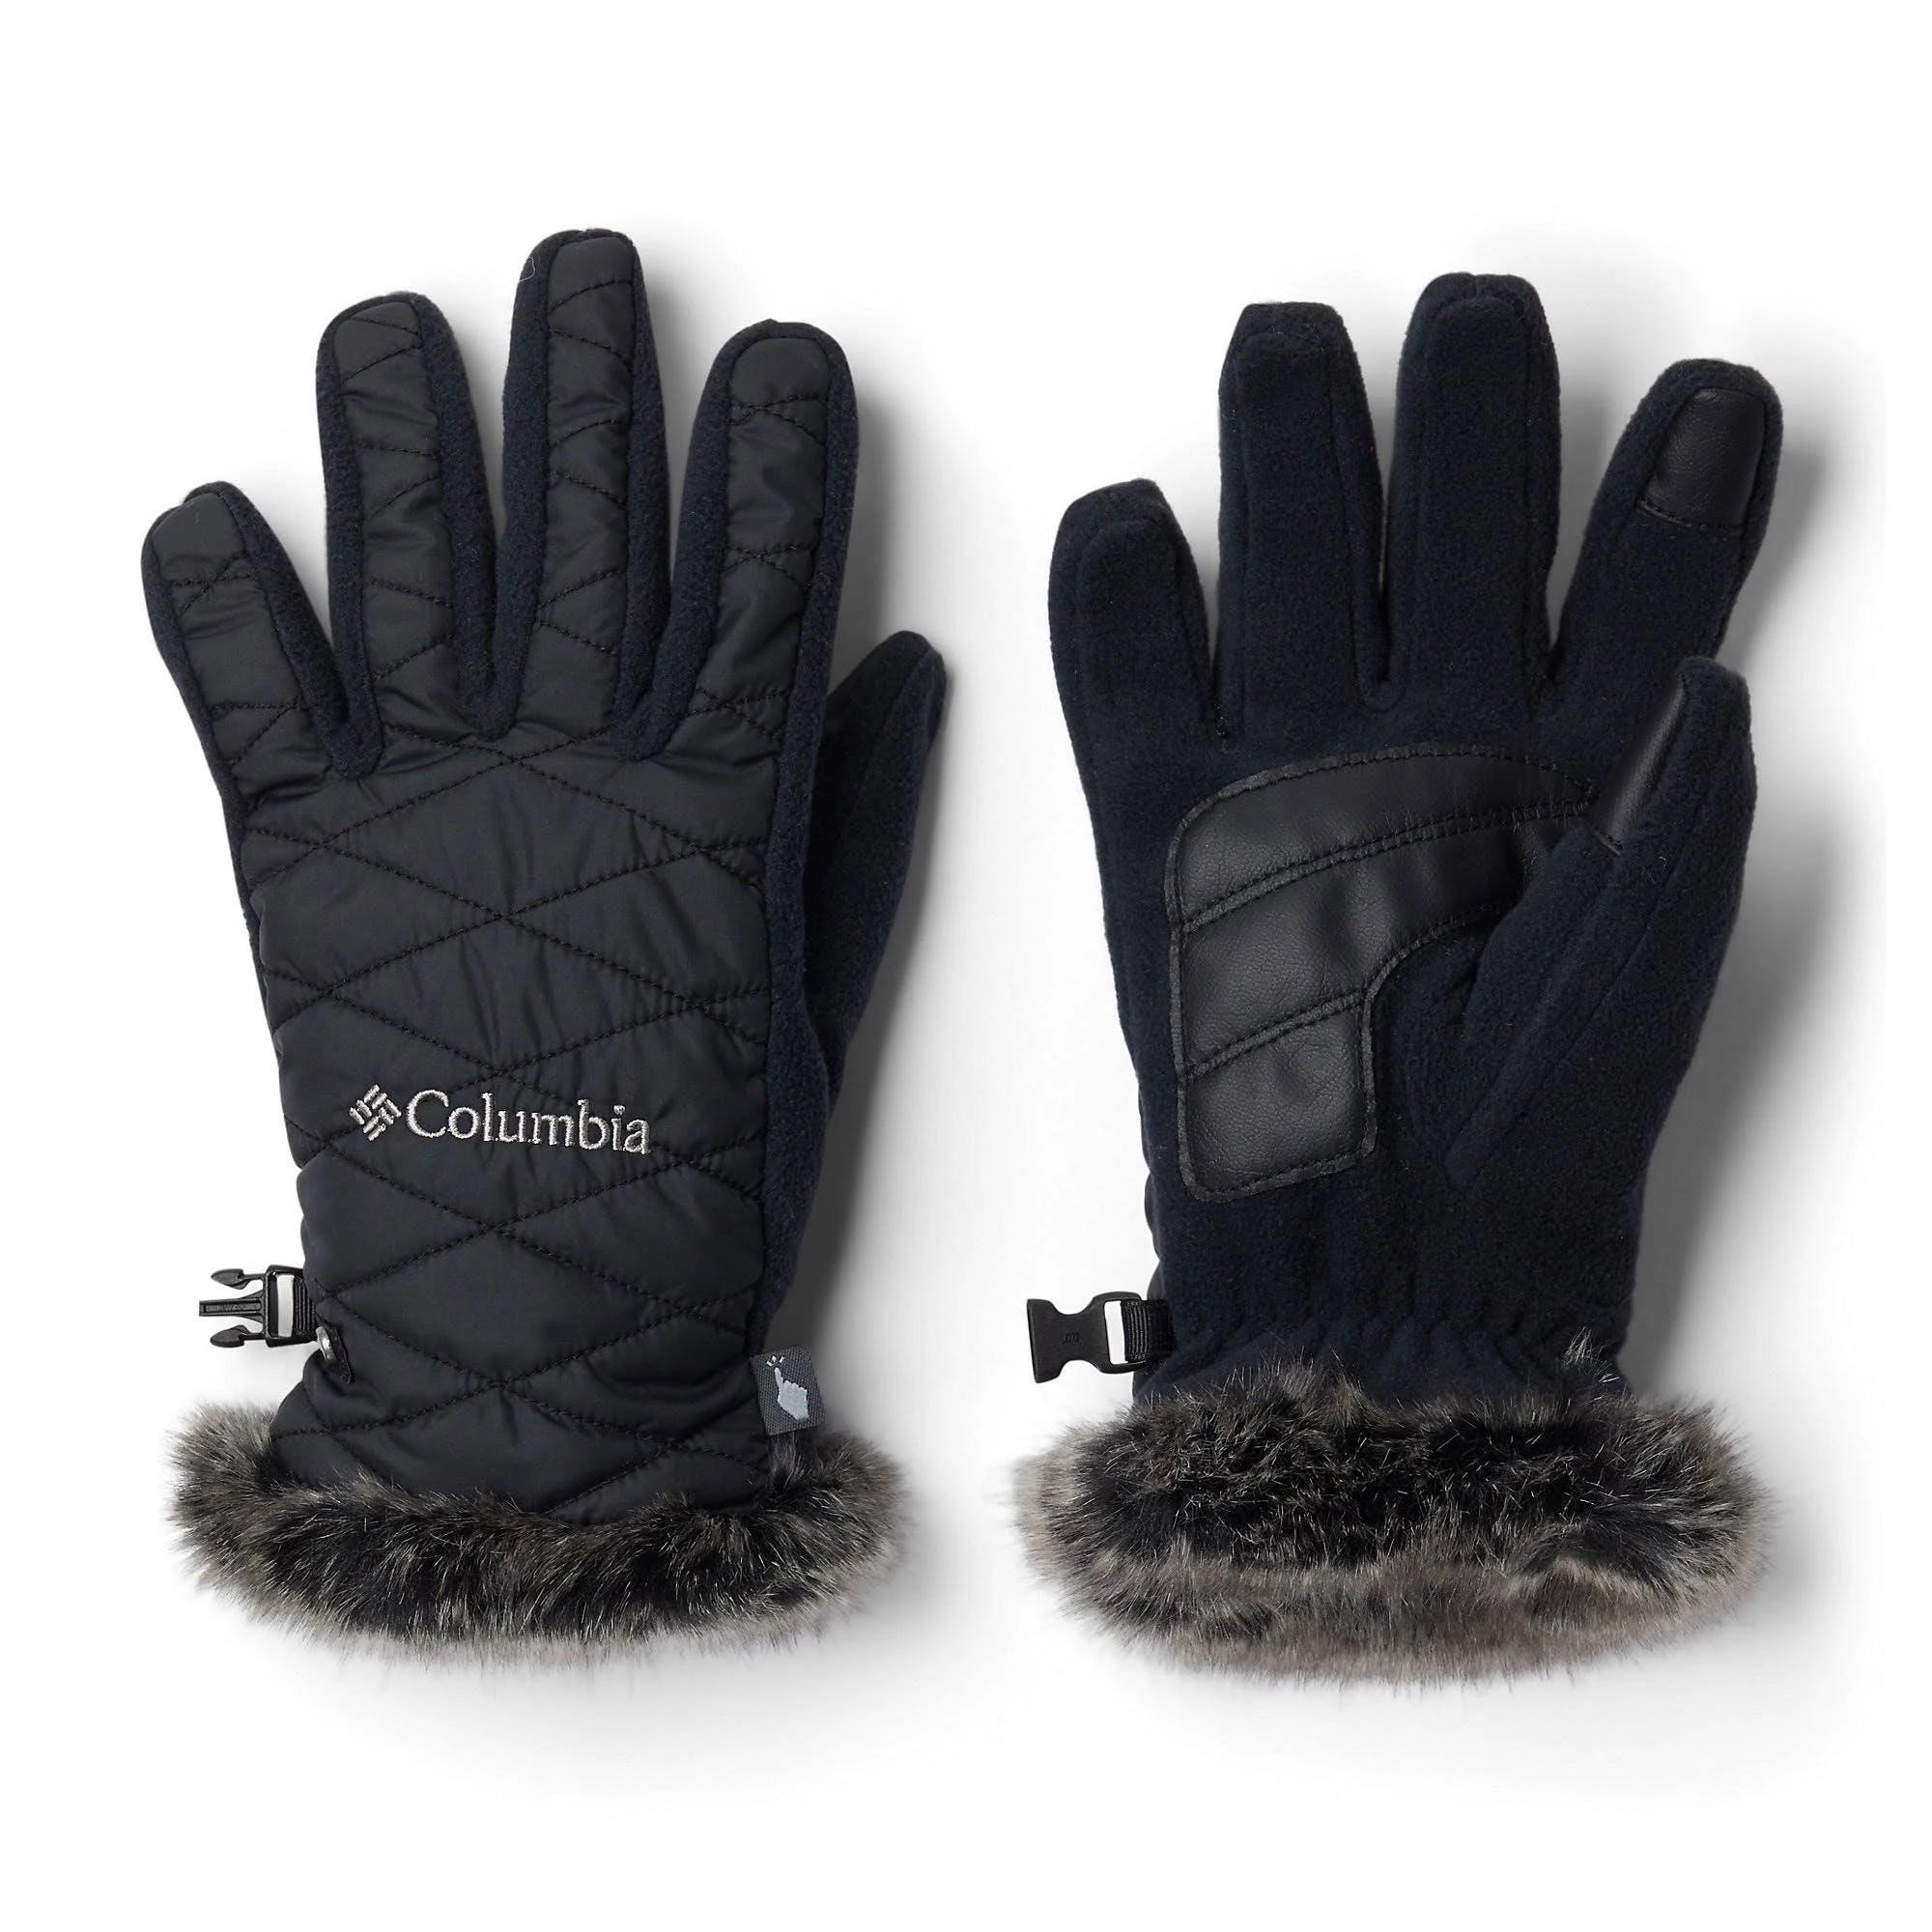 Columbia Women's Heavenly Glove Black